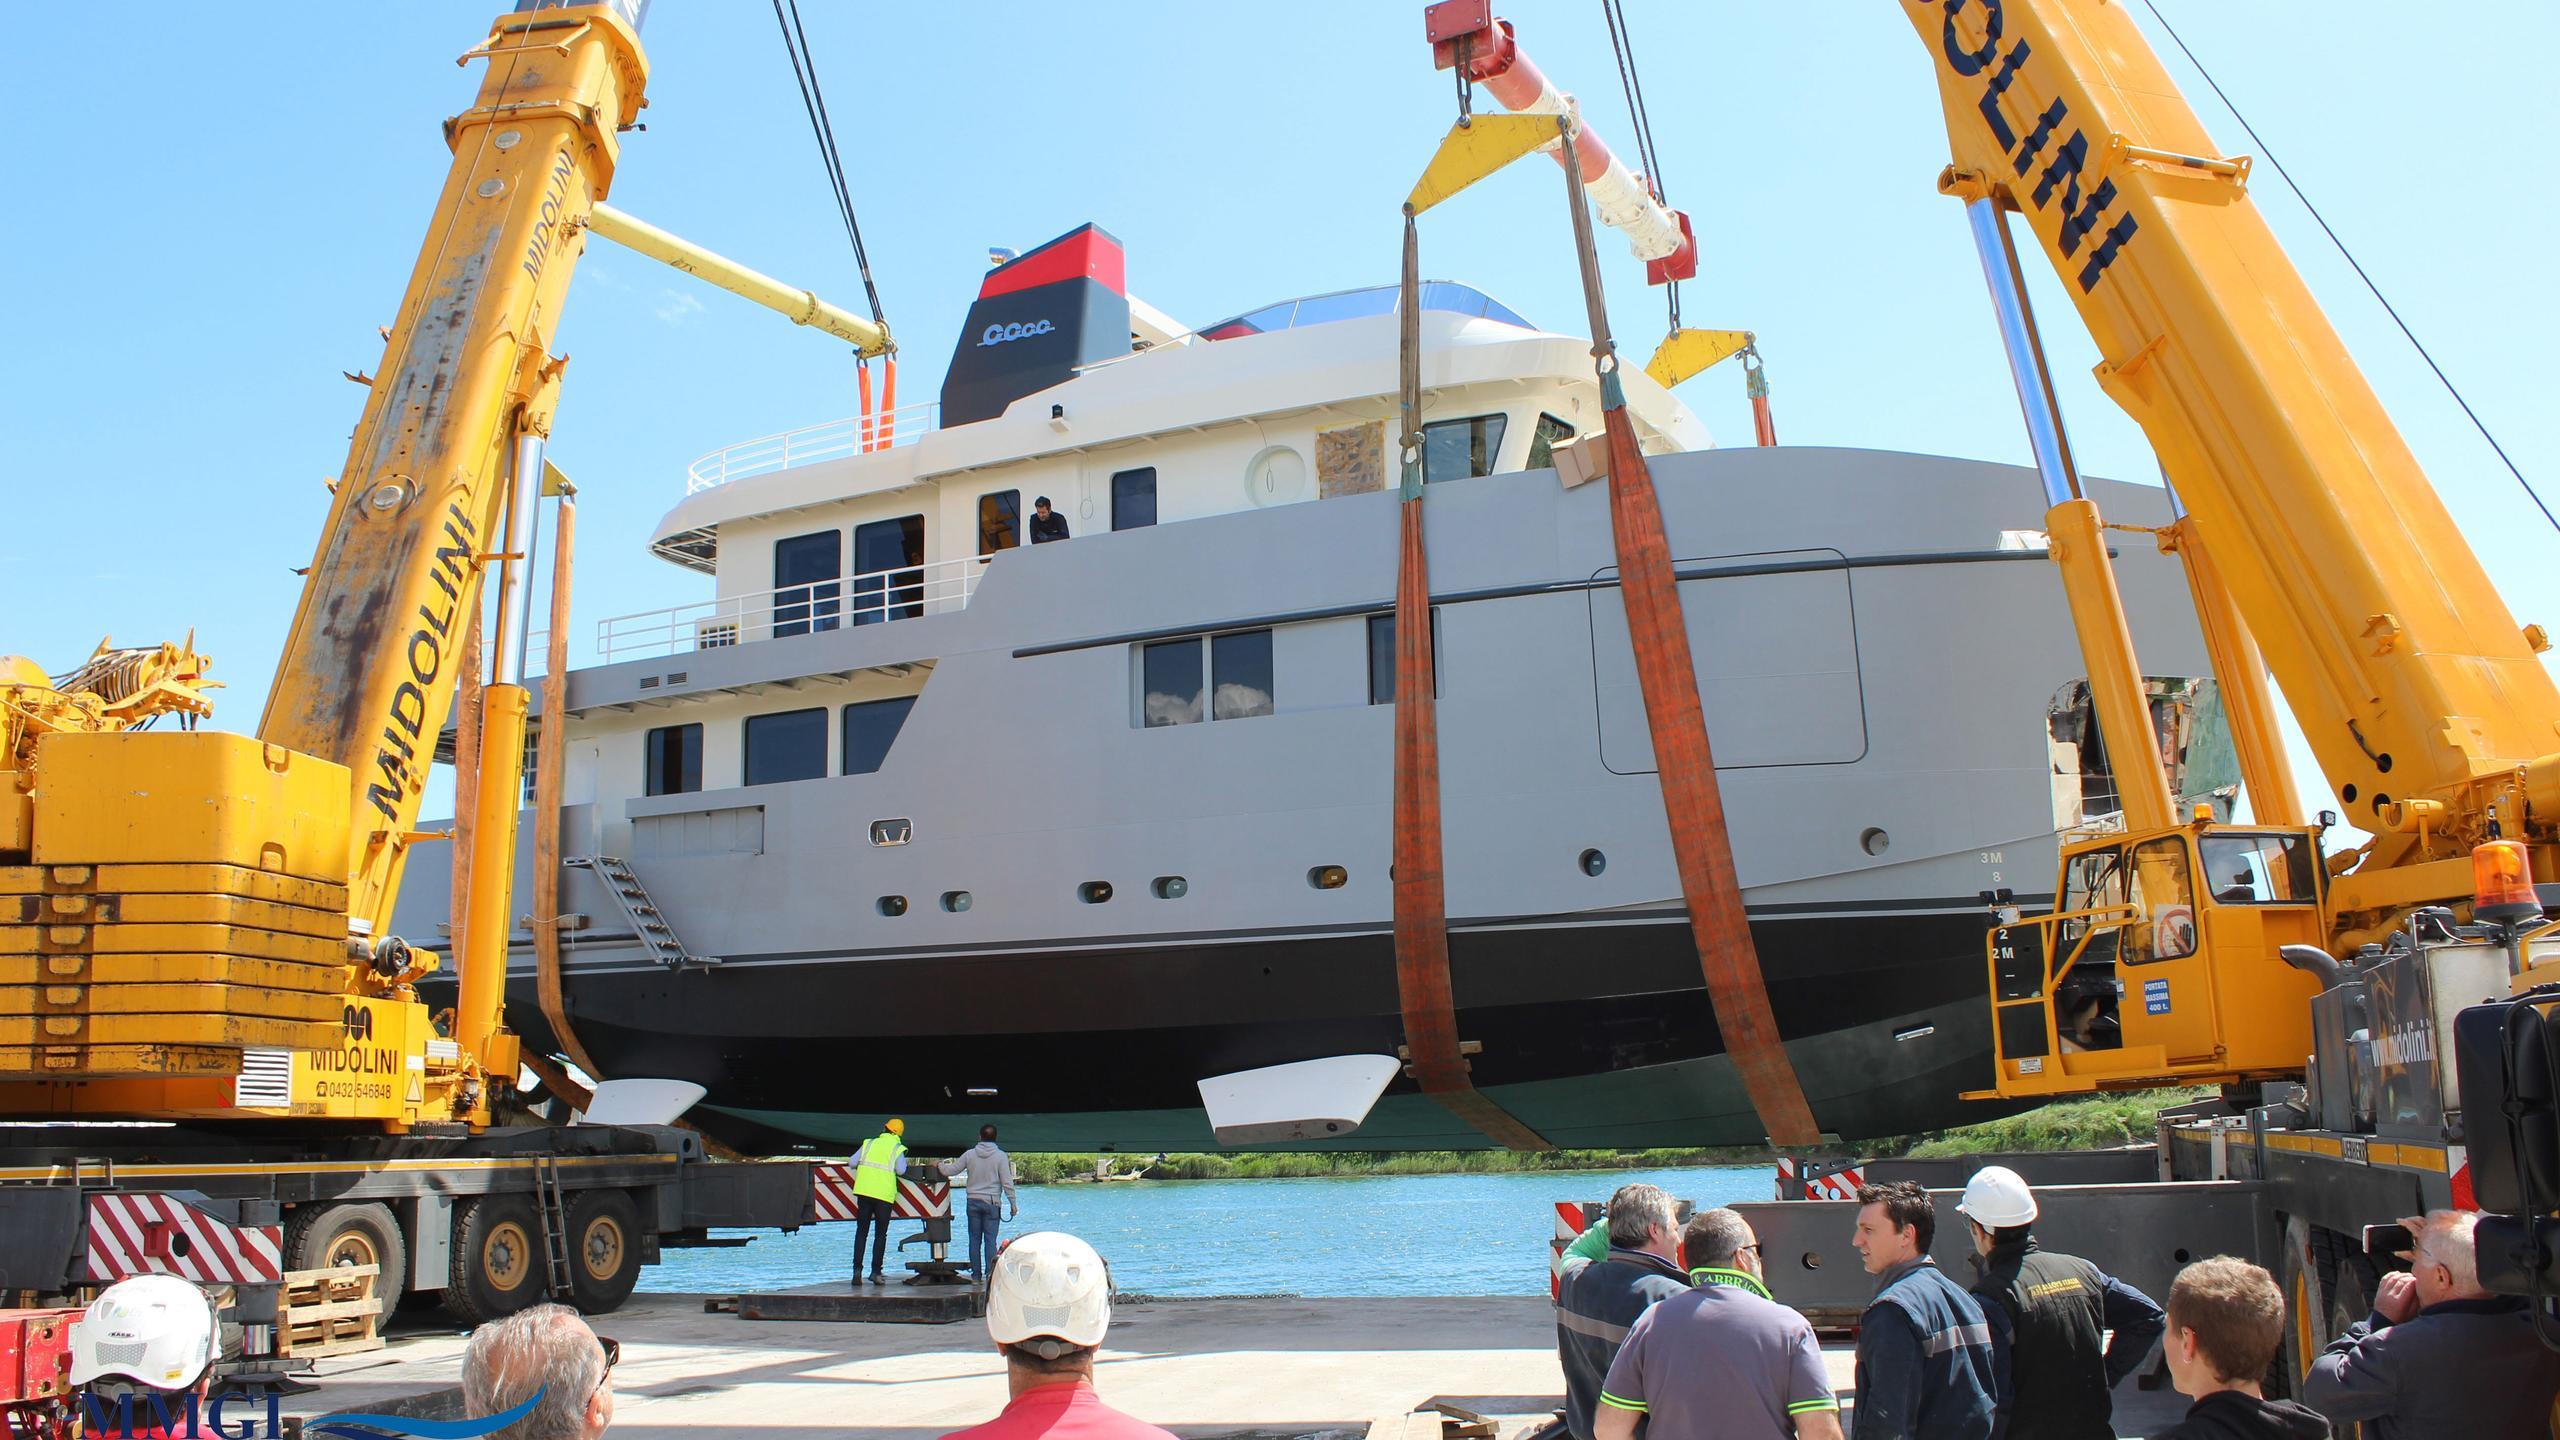 CAROLIN-IV-motor-yacht-mmgi-omega-forte-100-101m-2016-shipyard-cranes